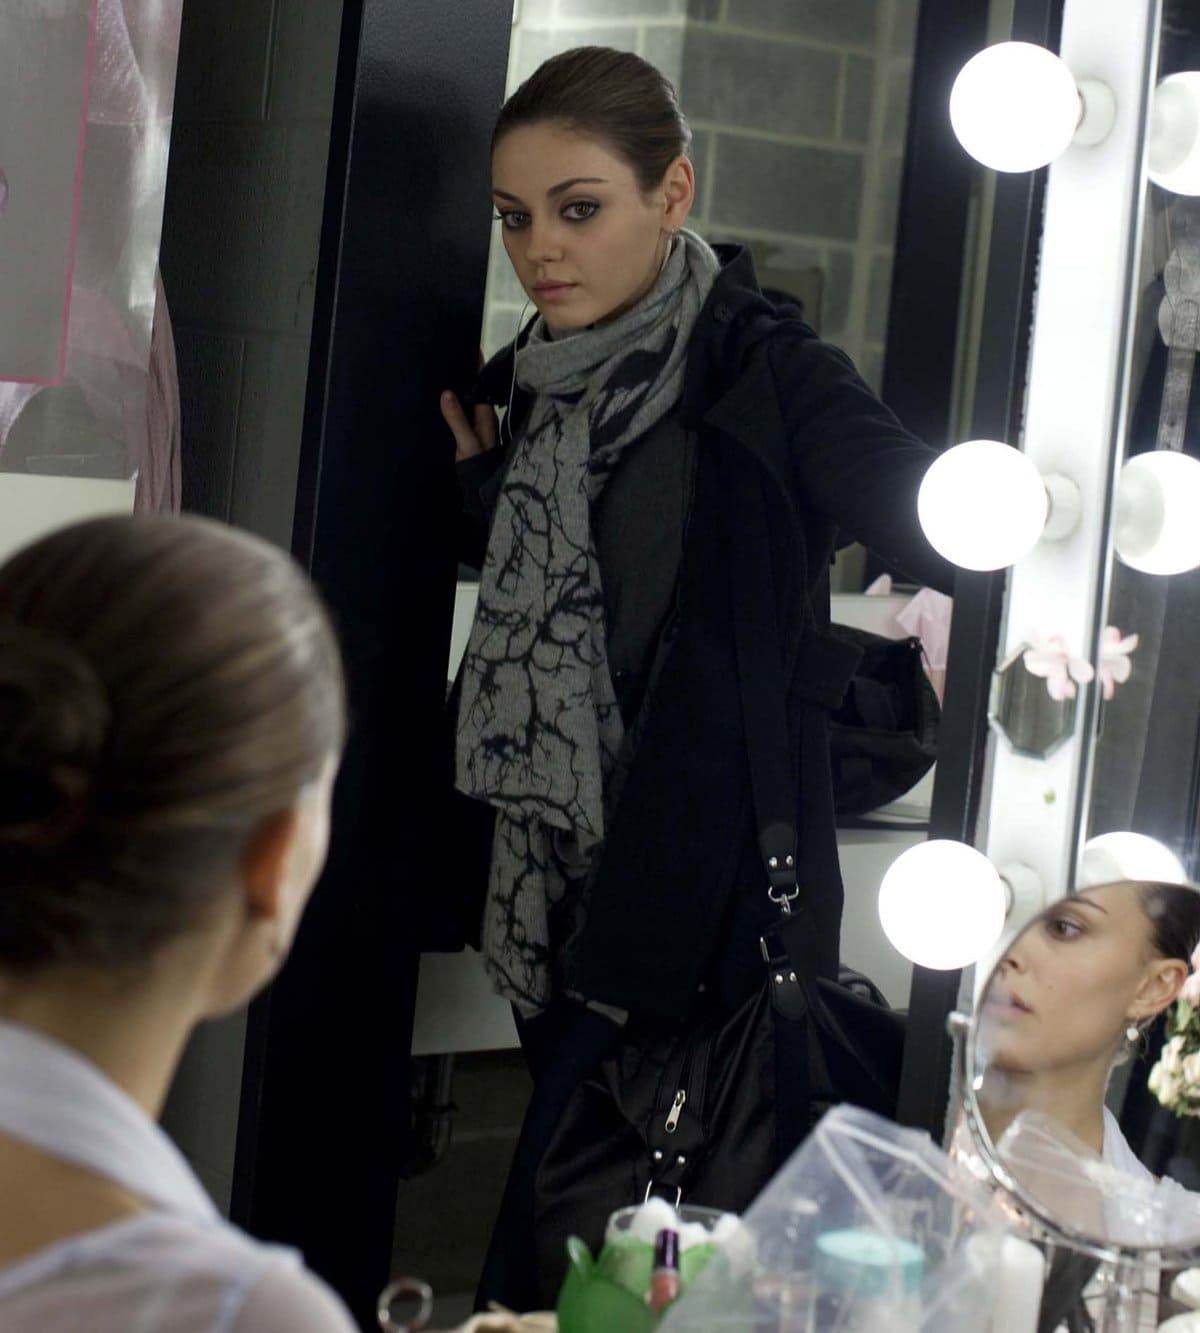 Natalie Portman and Mila Kunis became friends filming the 2010 dance drama Black Swan